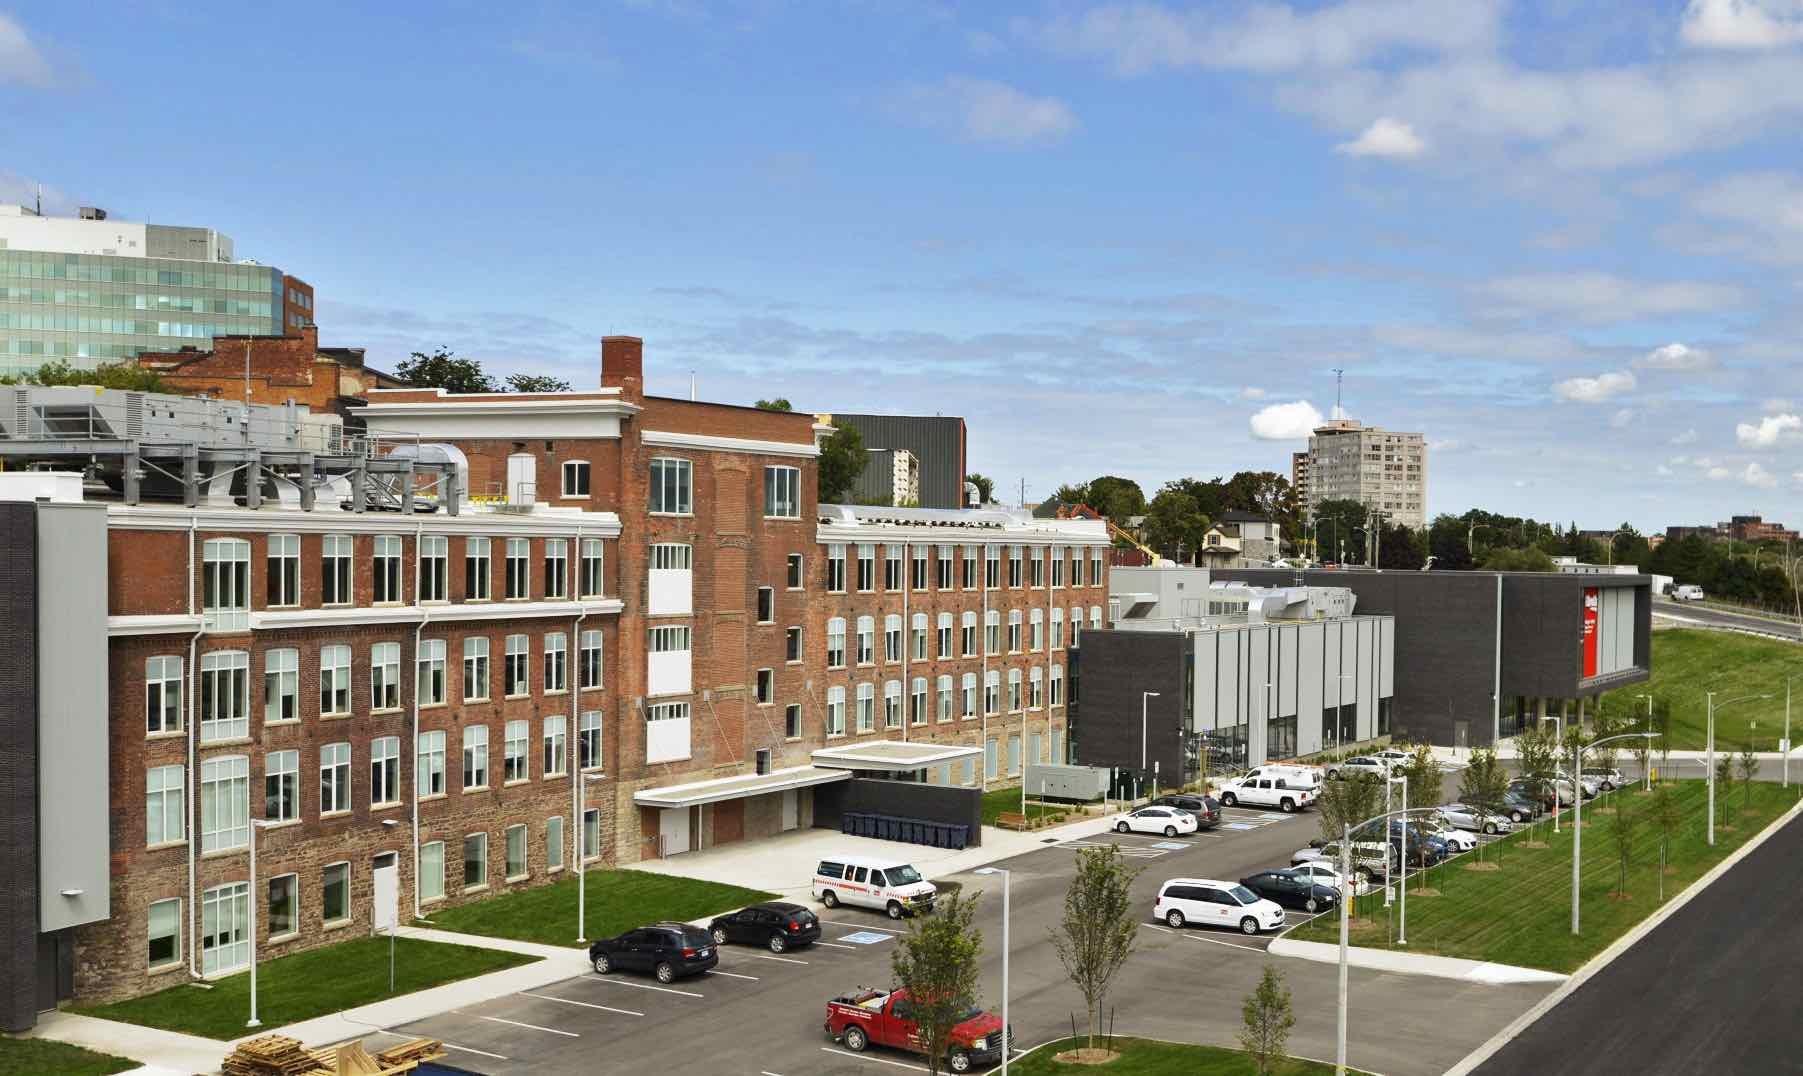 Brock University – Marilyn I. Walker School of Fine and Performing Arts